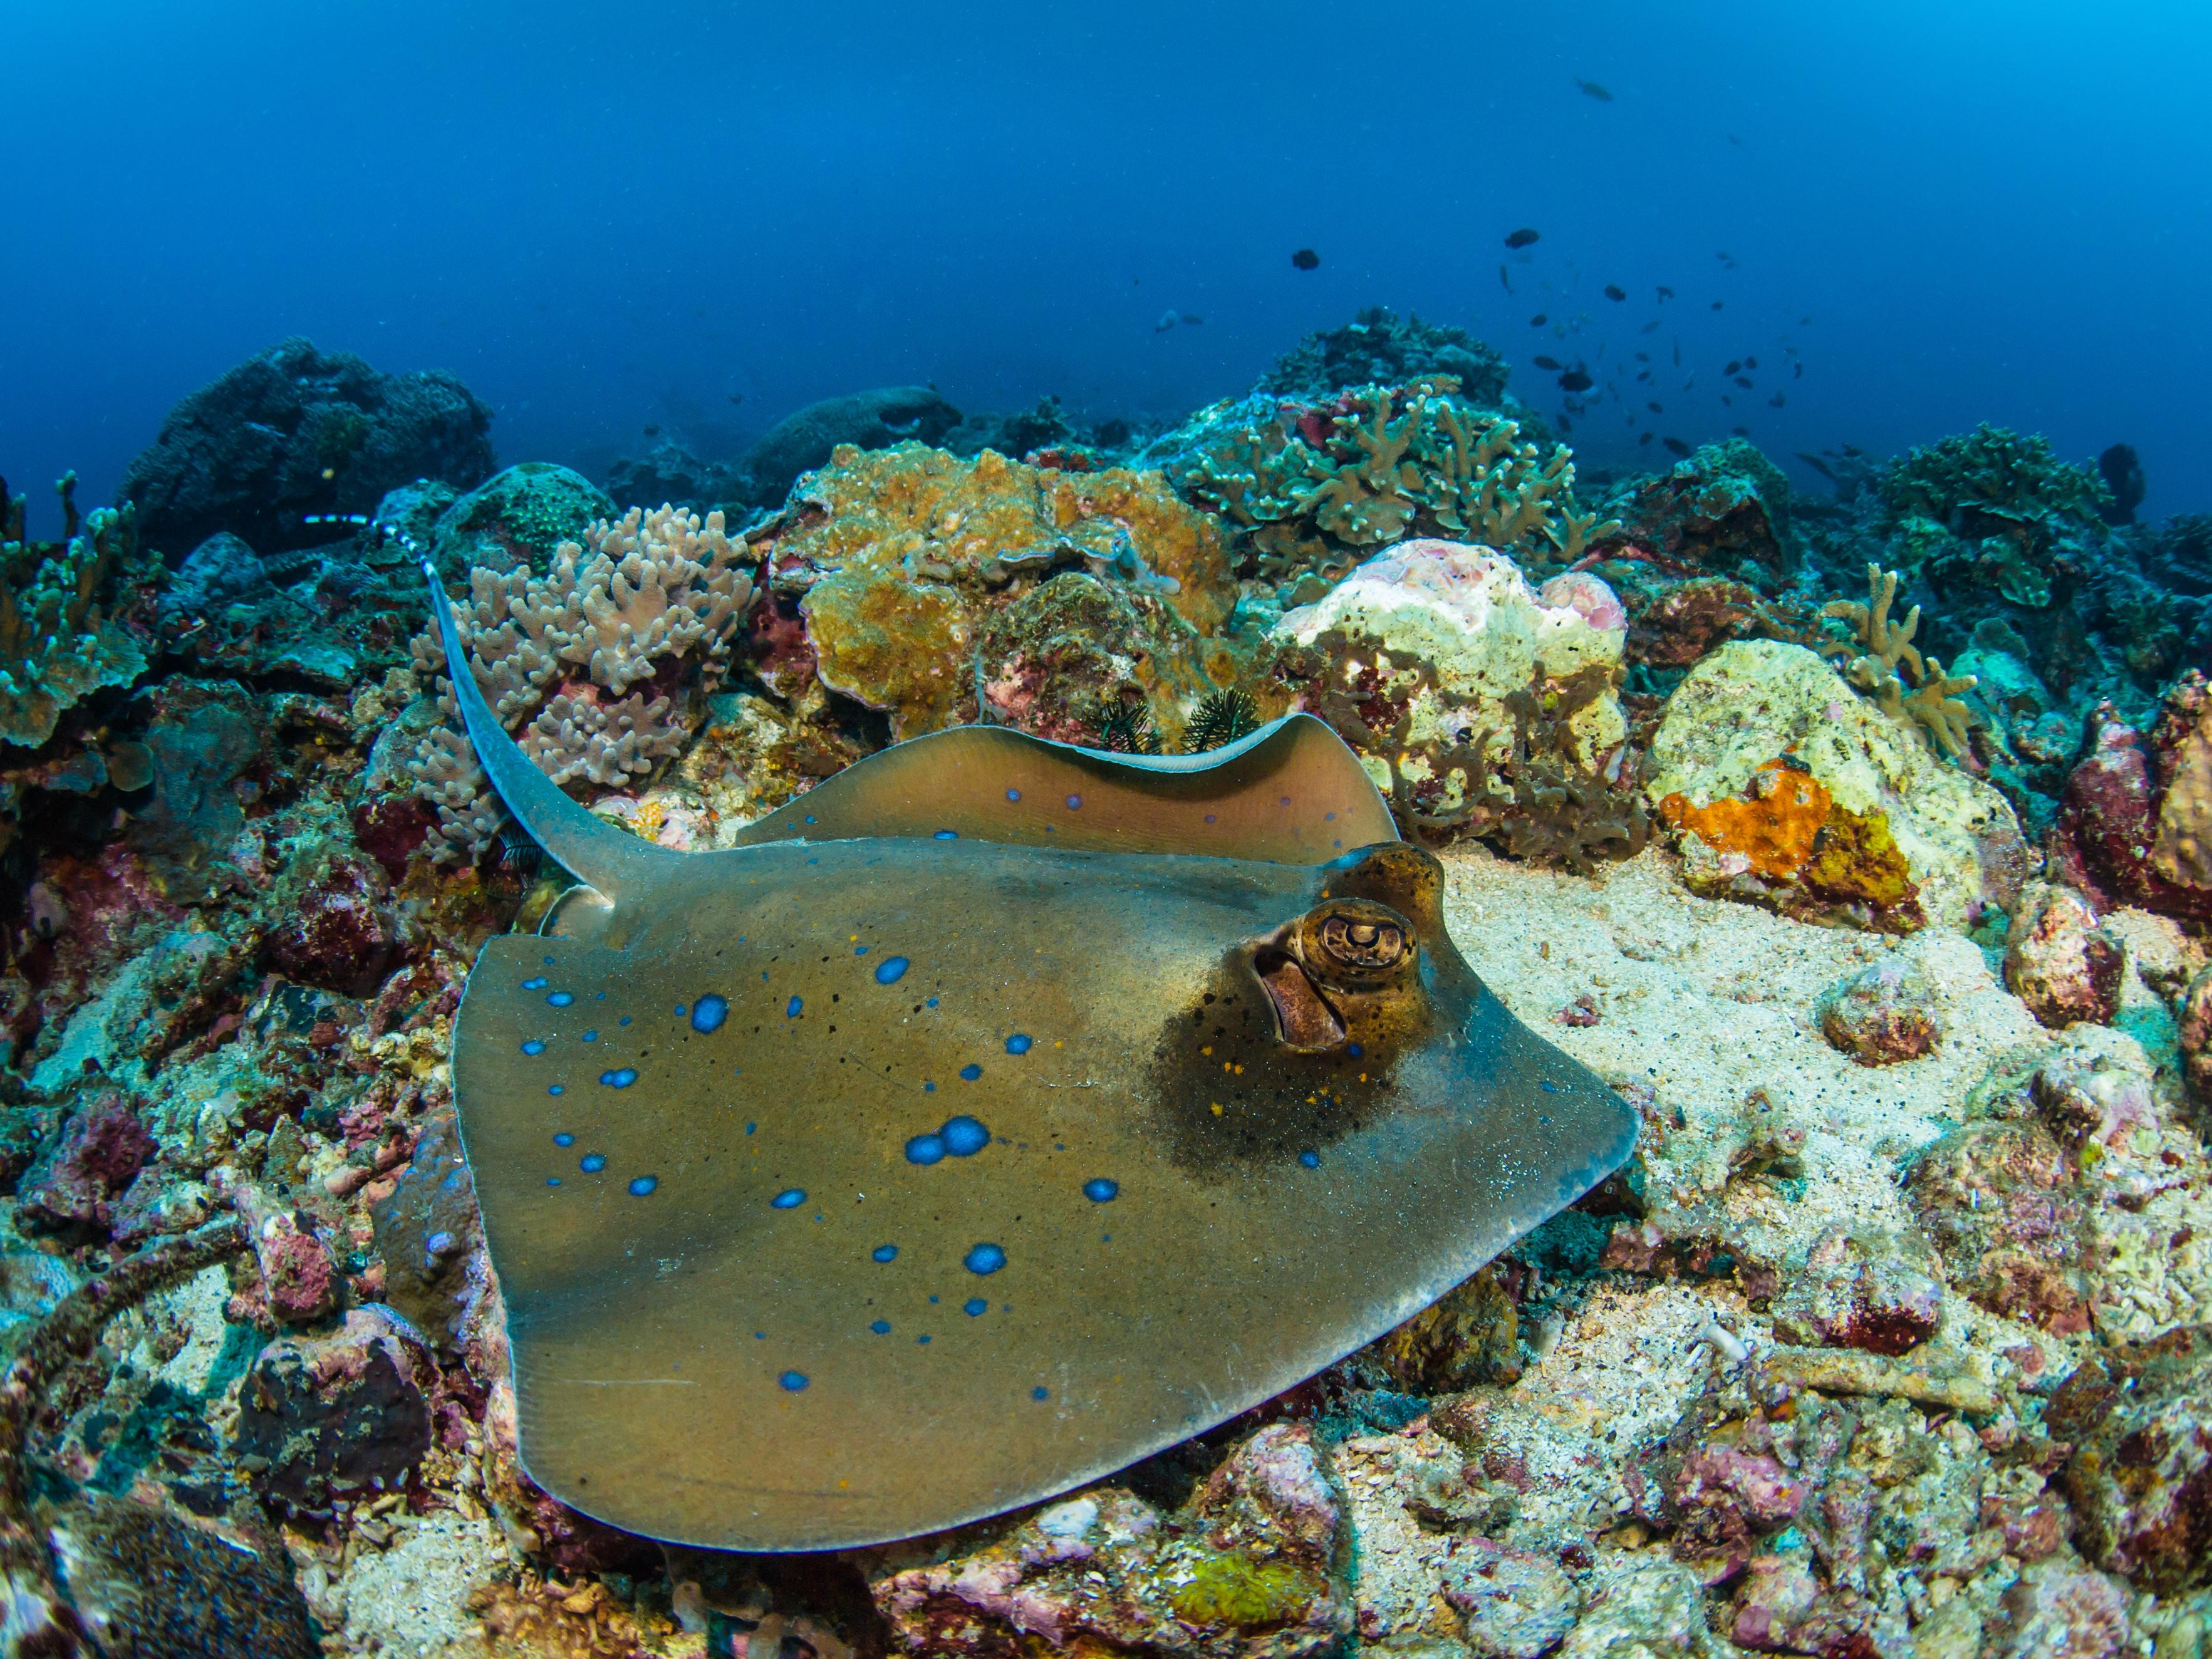 Underwater Photographic Assignment